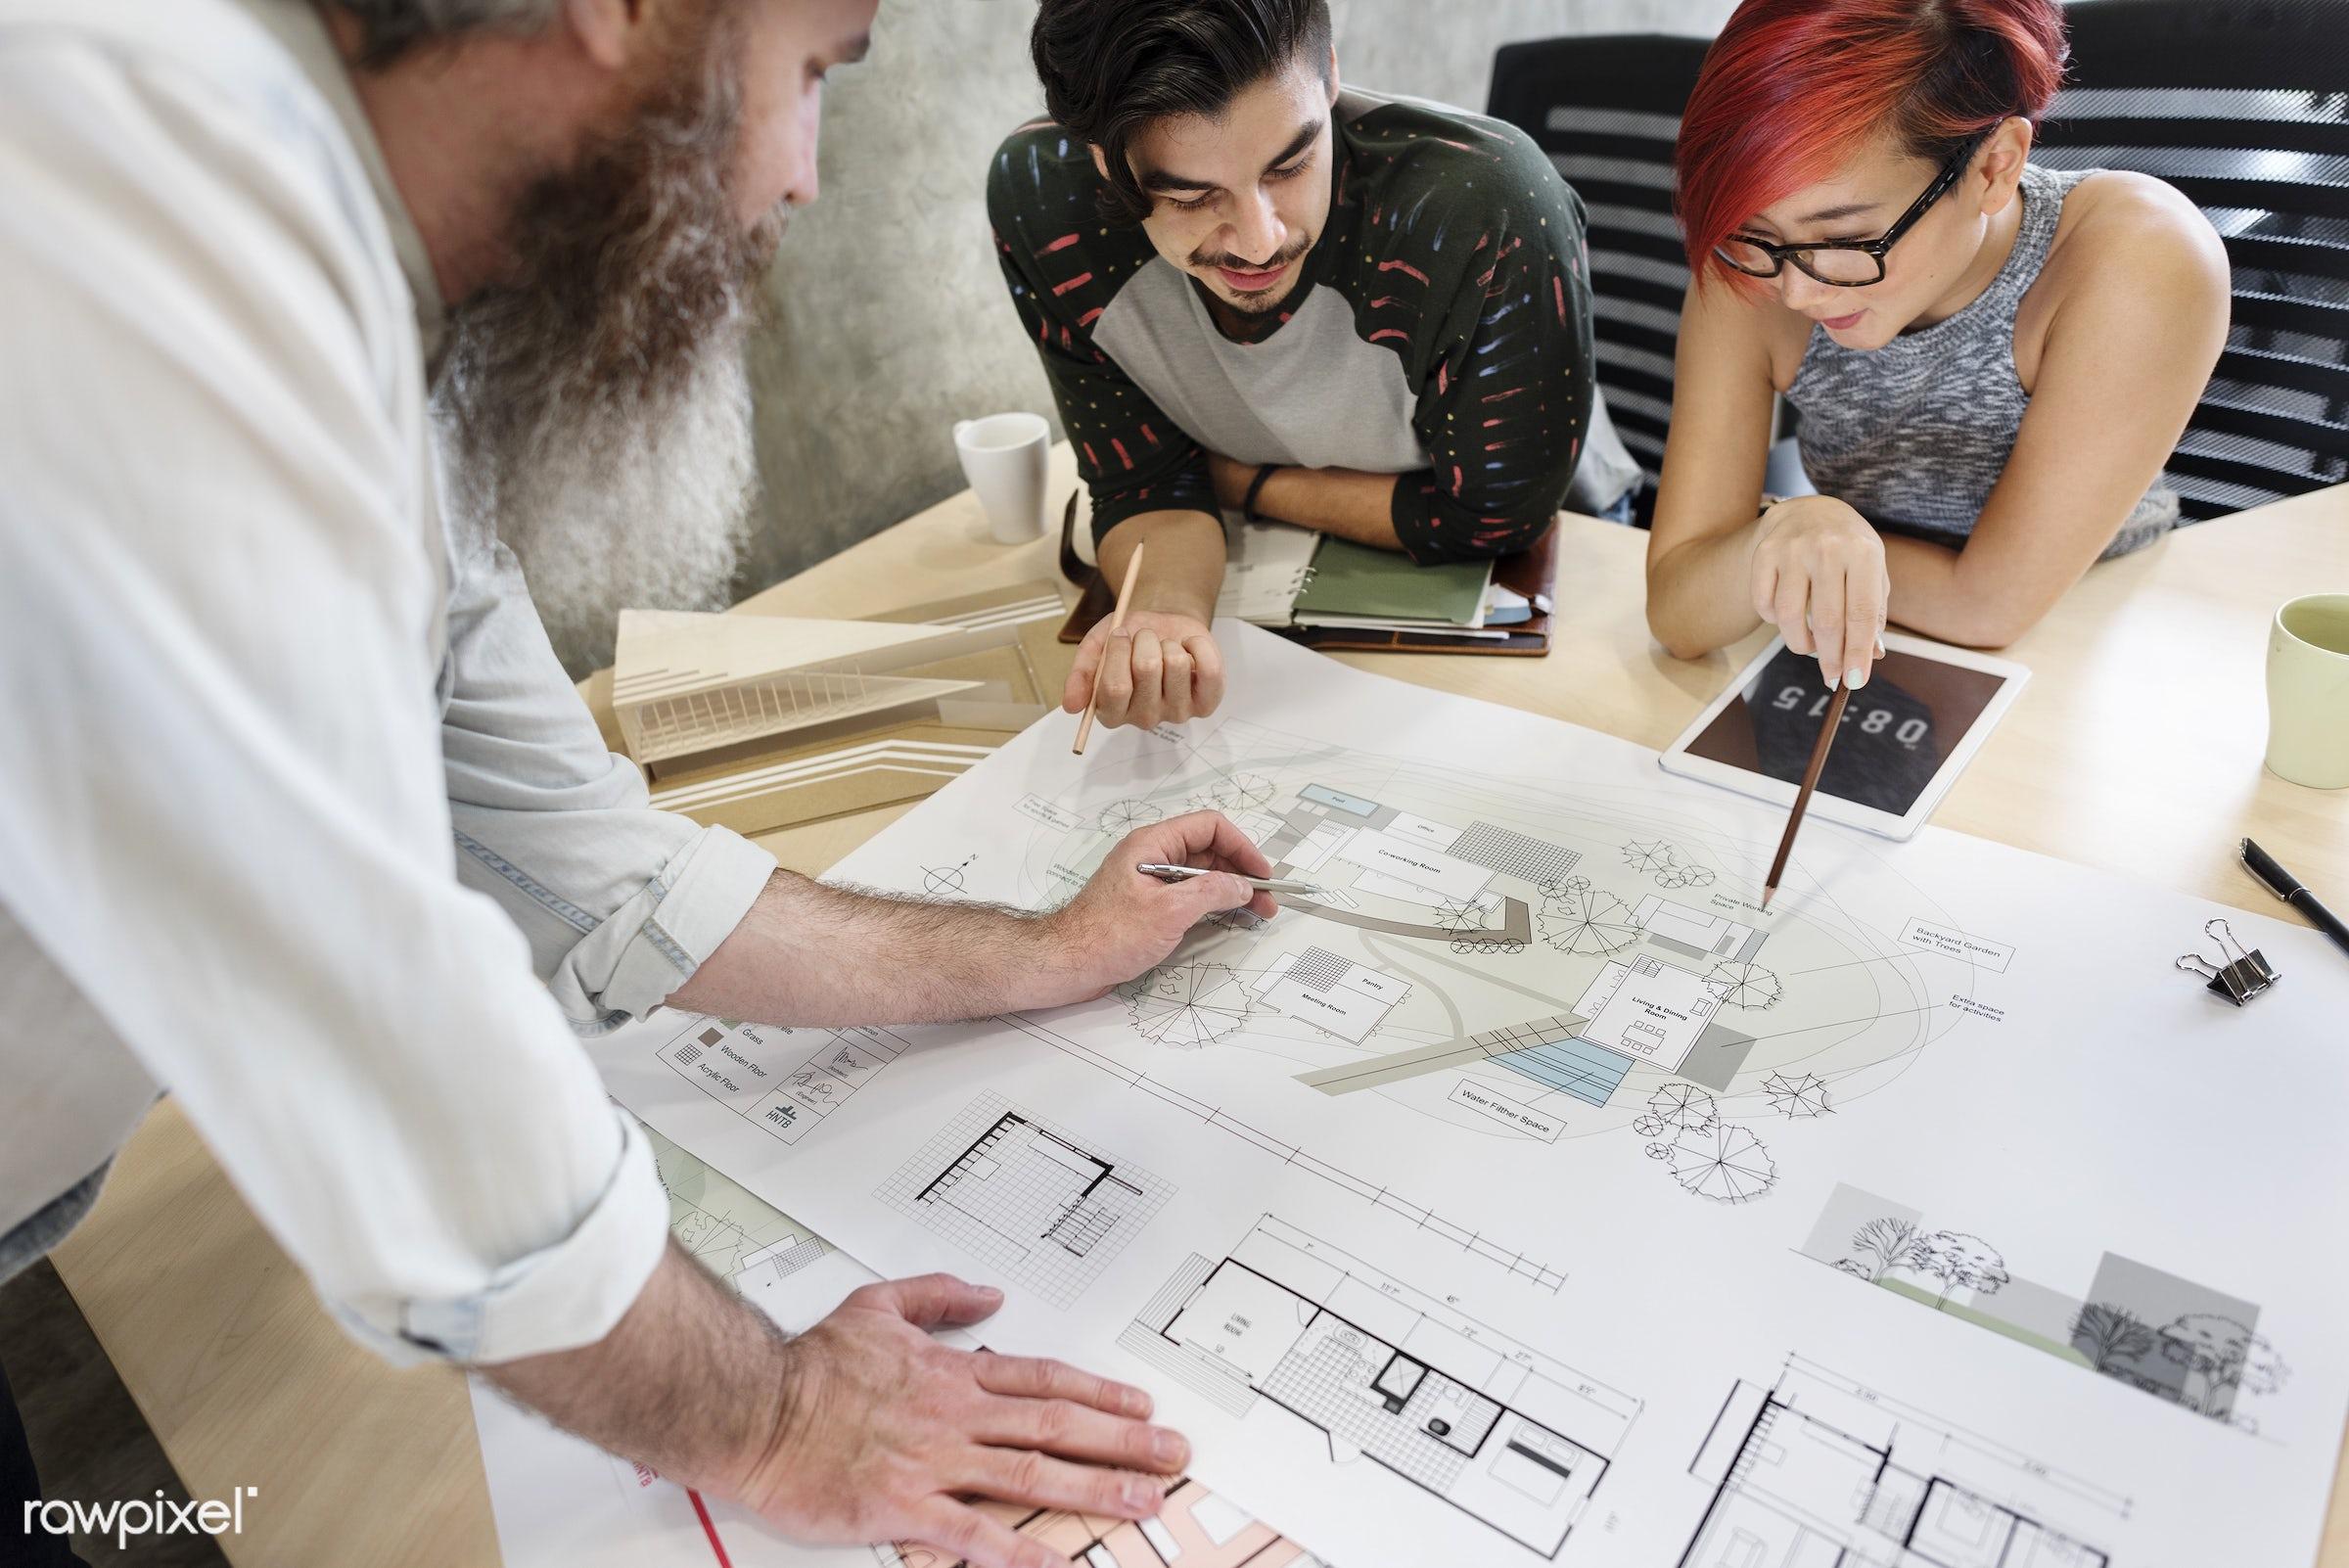 architect, architecture, asian ethnicity, assistance, blueprint, brainstorming, communication, connection, creative...